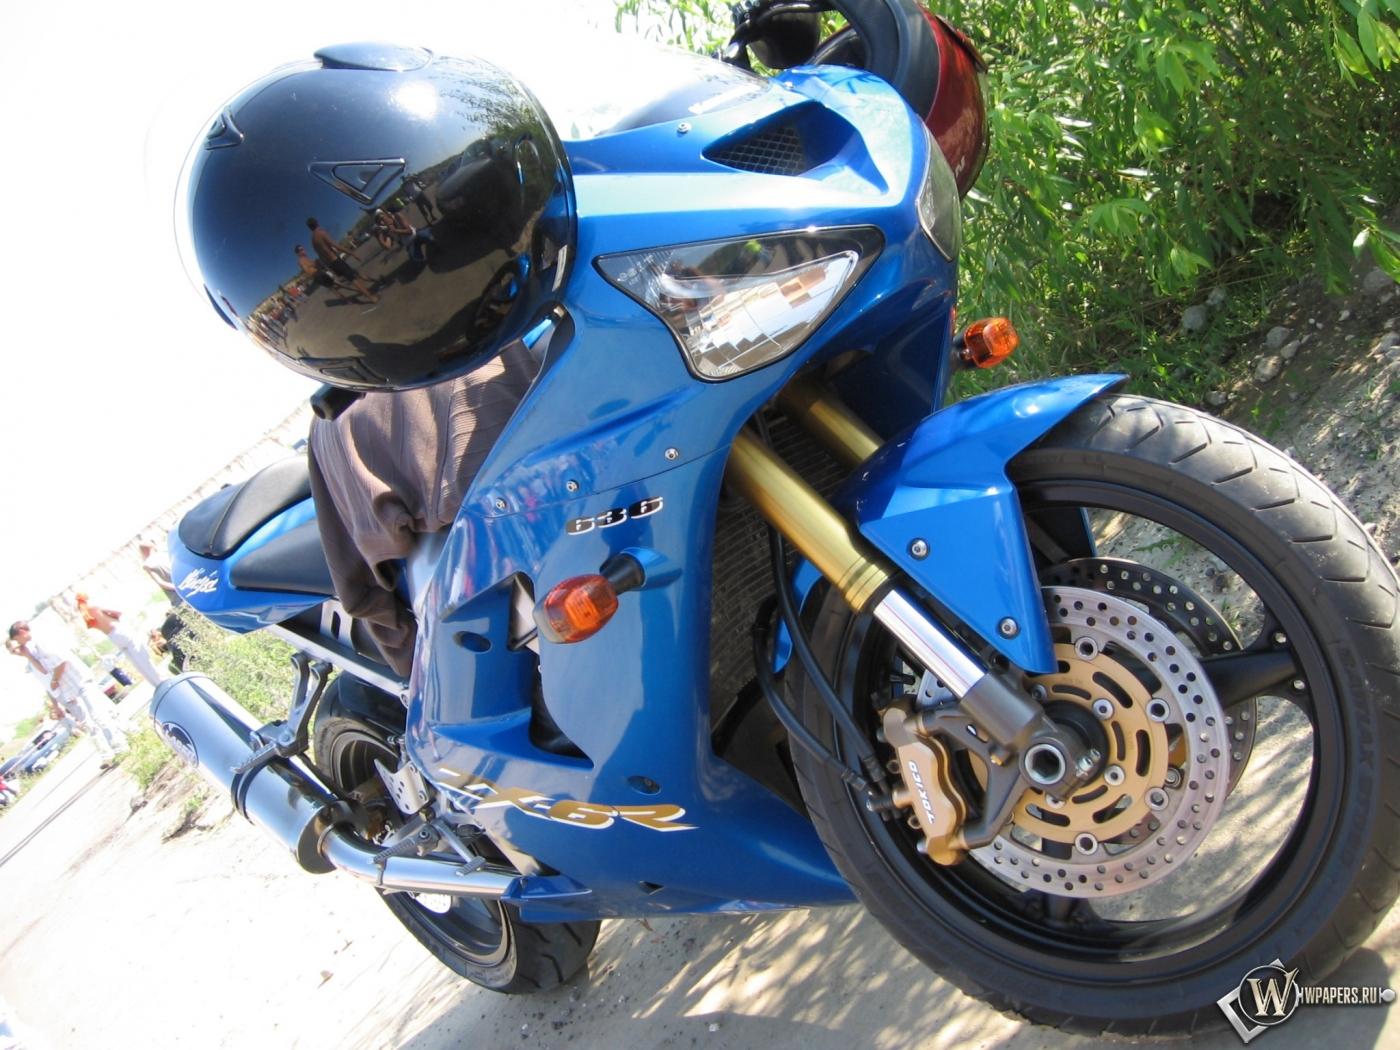 Kawasaki Ninja 1400x1050